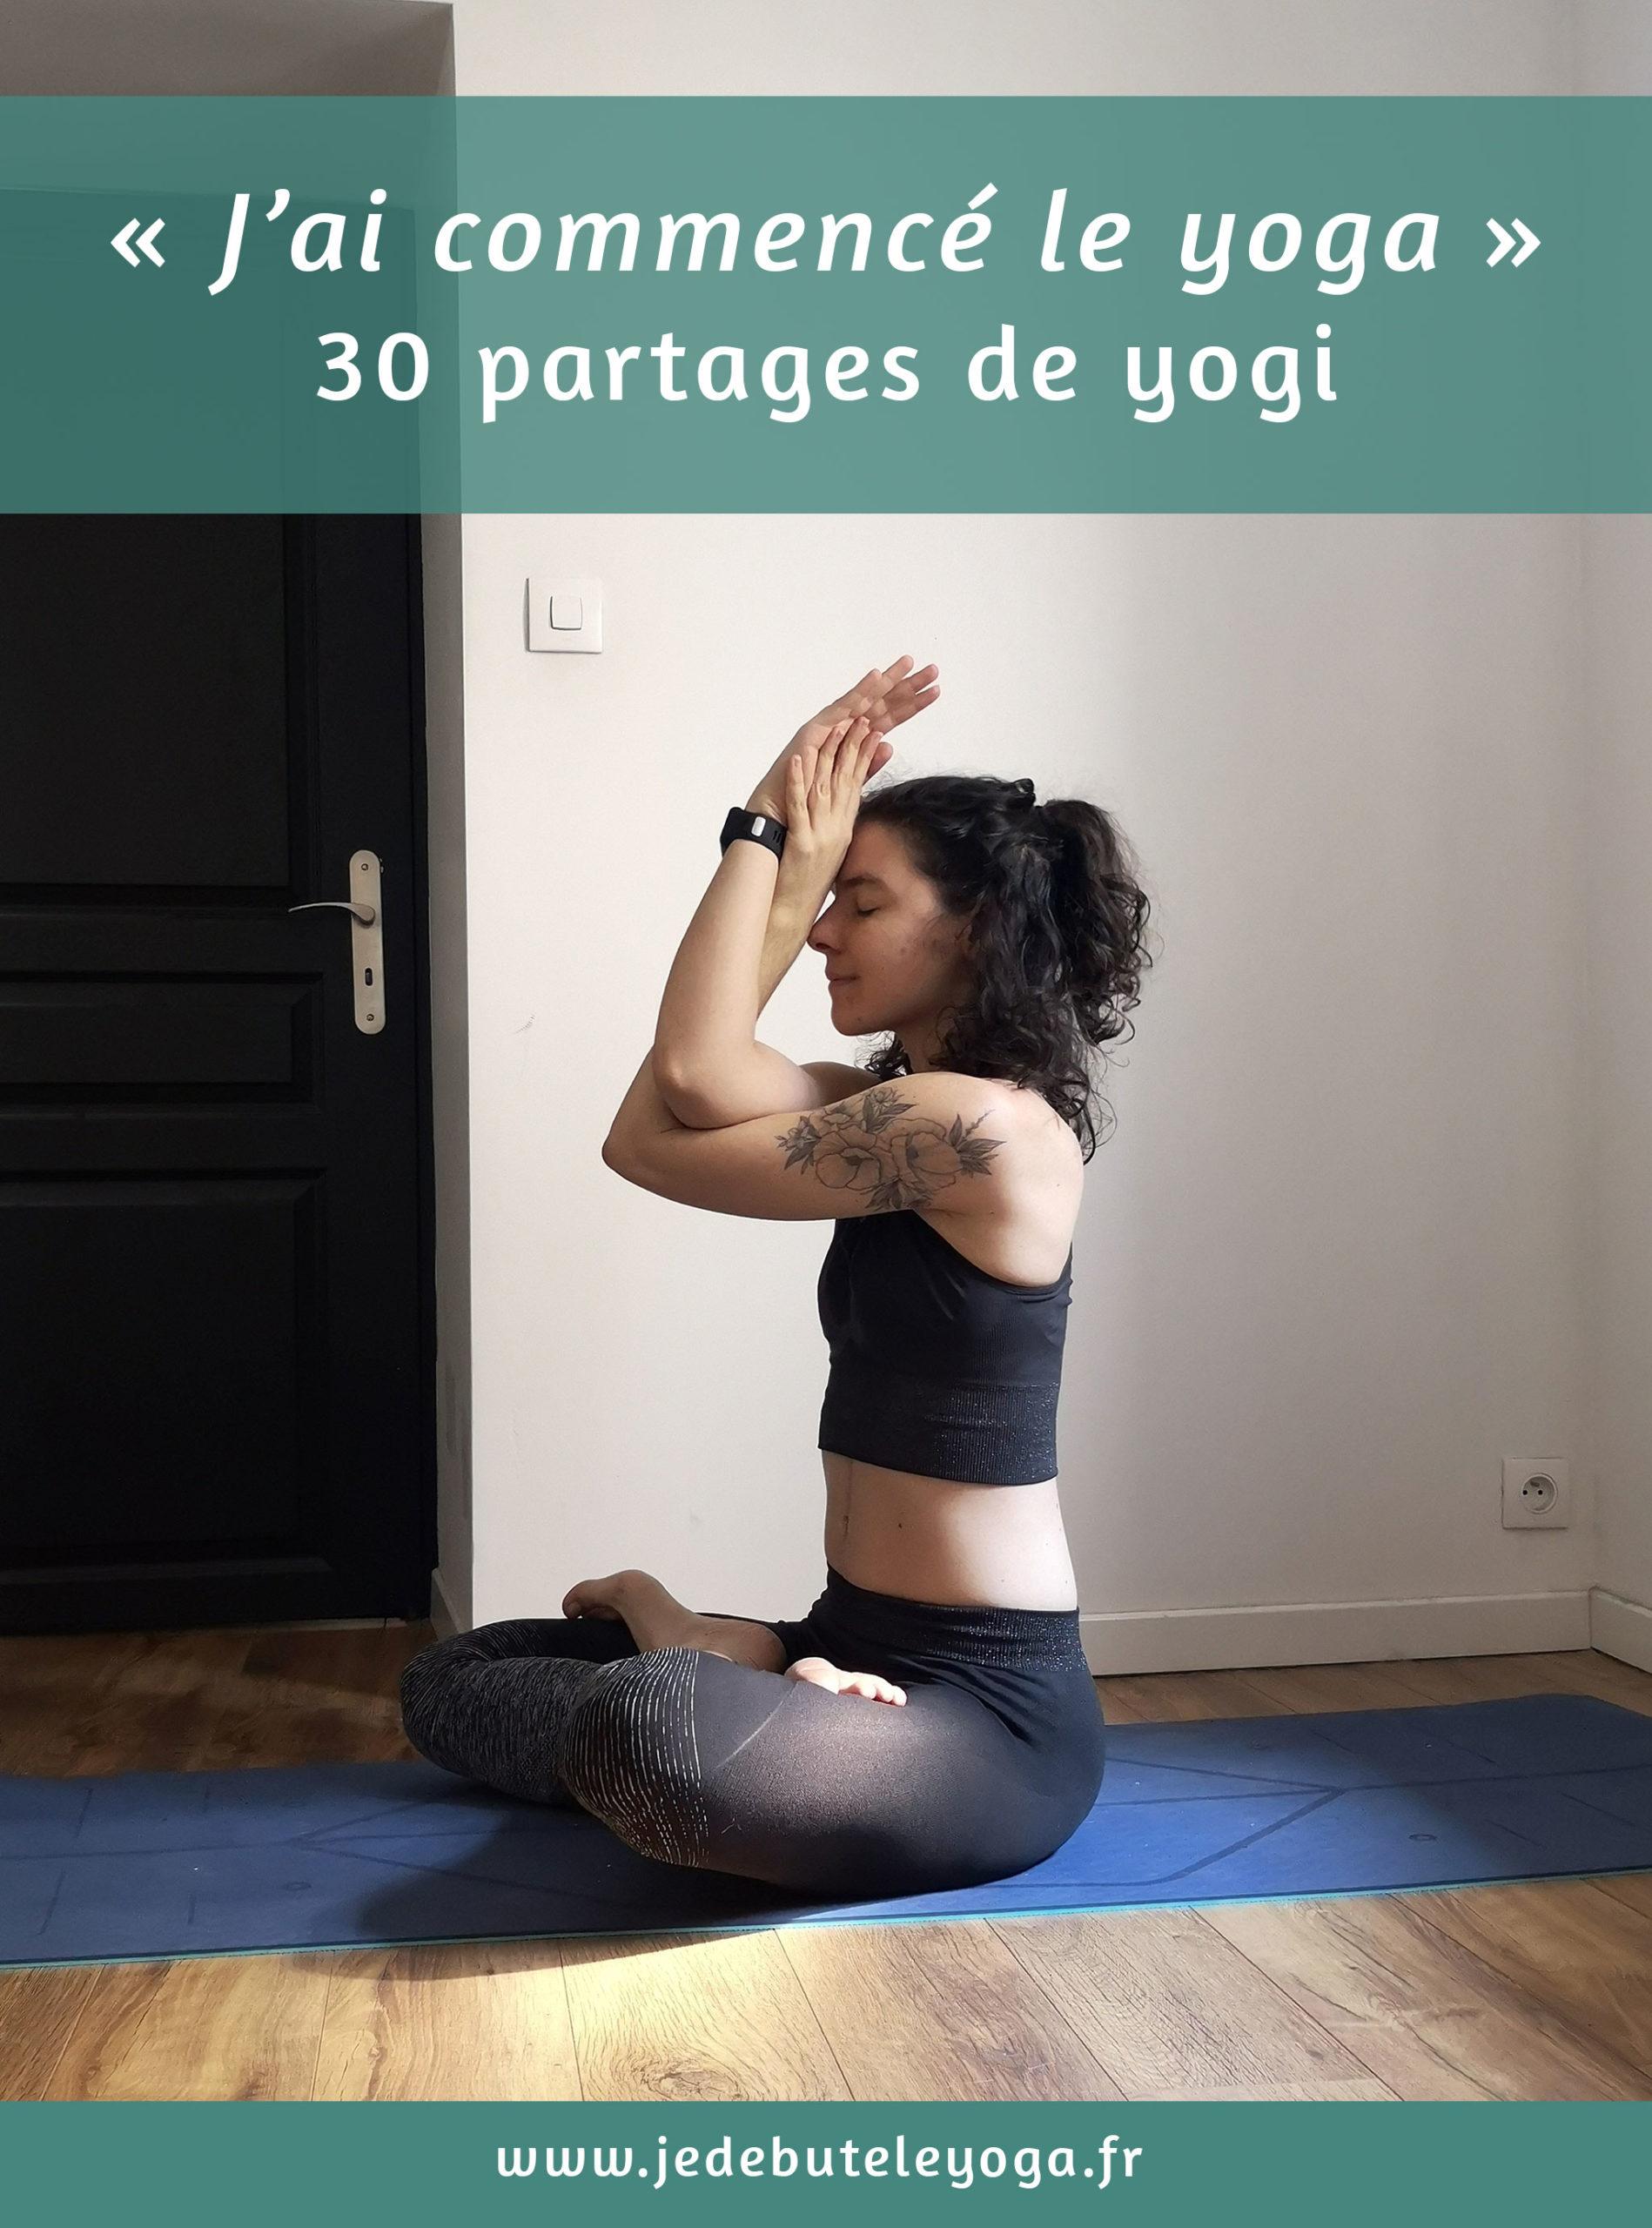 30 témoignages de yogi